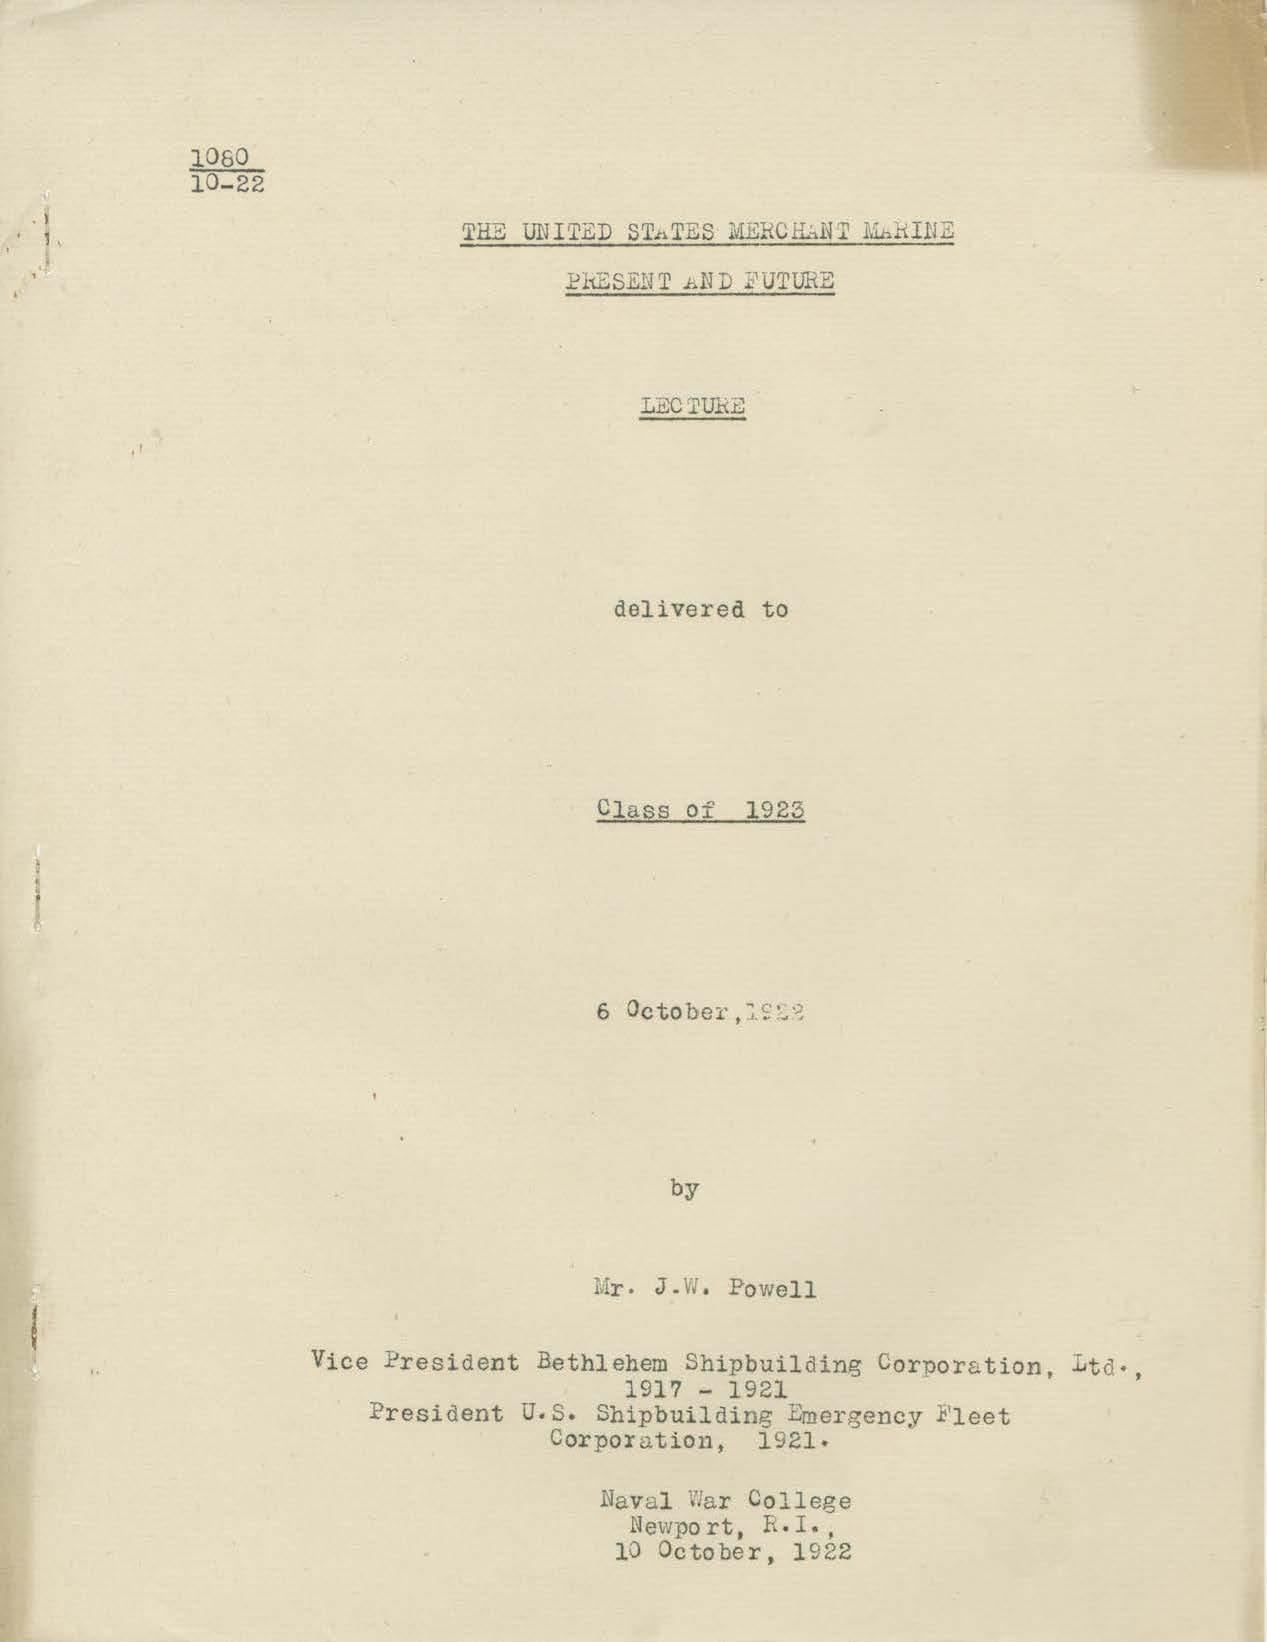 United States Merchant Marine, Present and Future, J. W. Powell